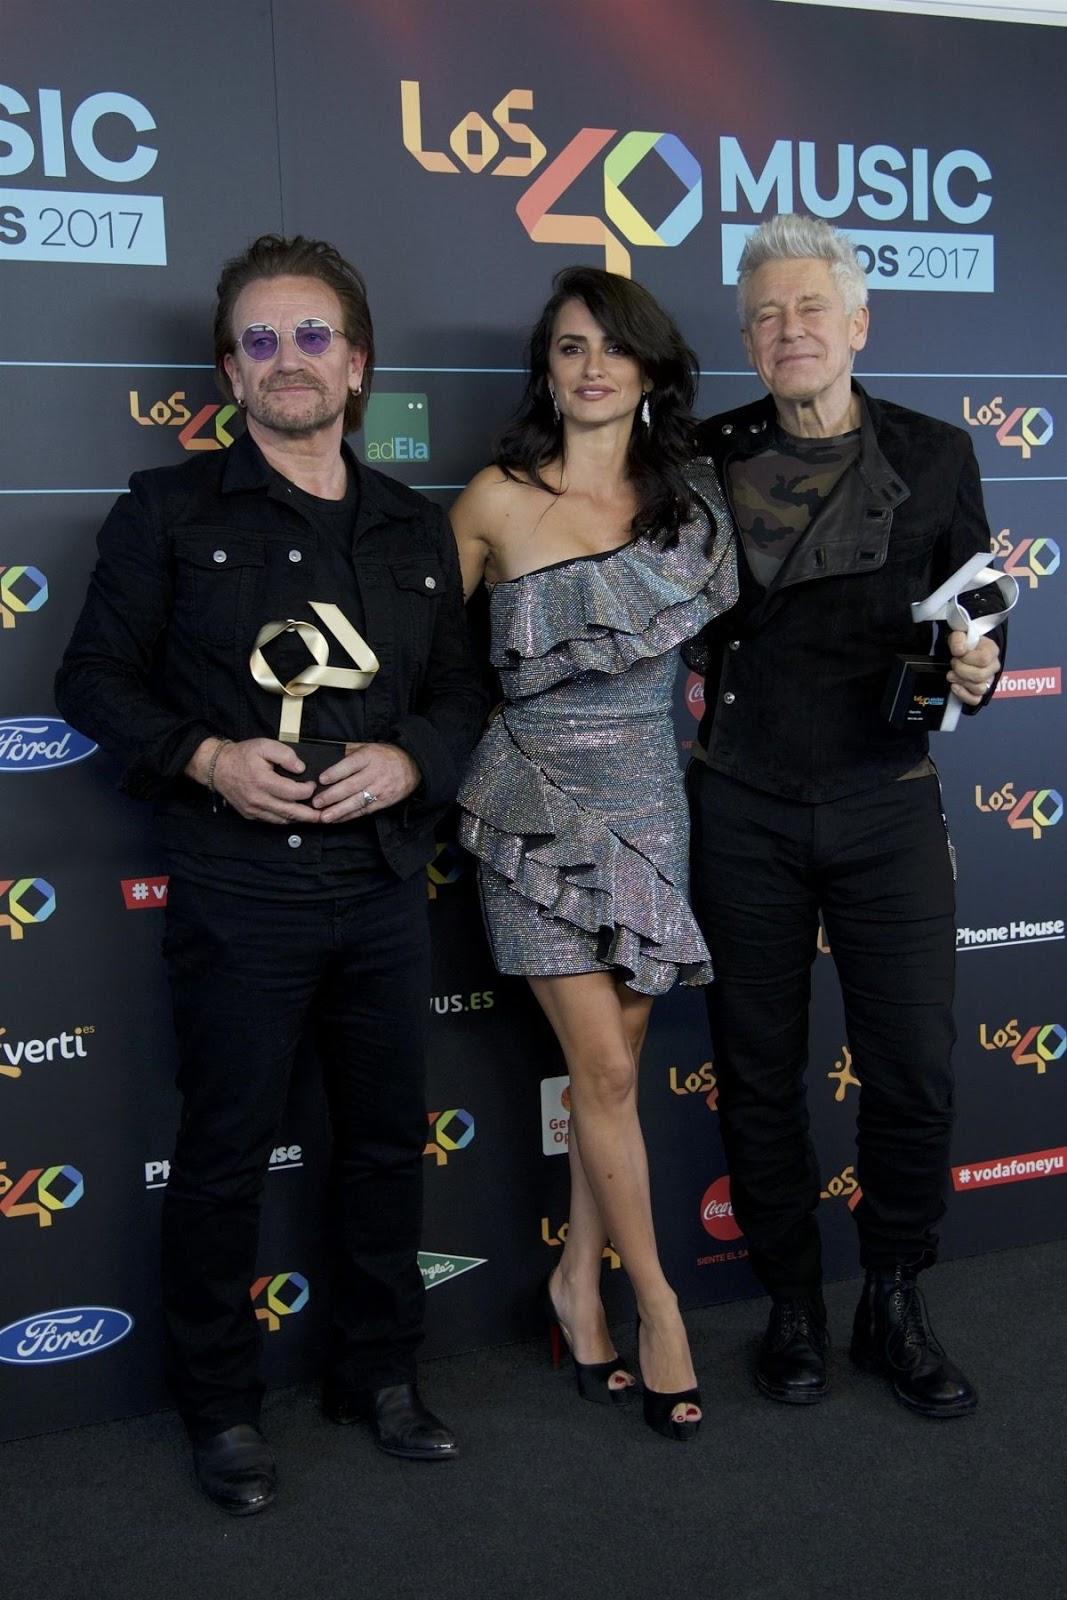 Hot and Sexy Penélope Cruz at 2017 Principales Music Awards in Madrid